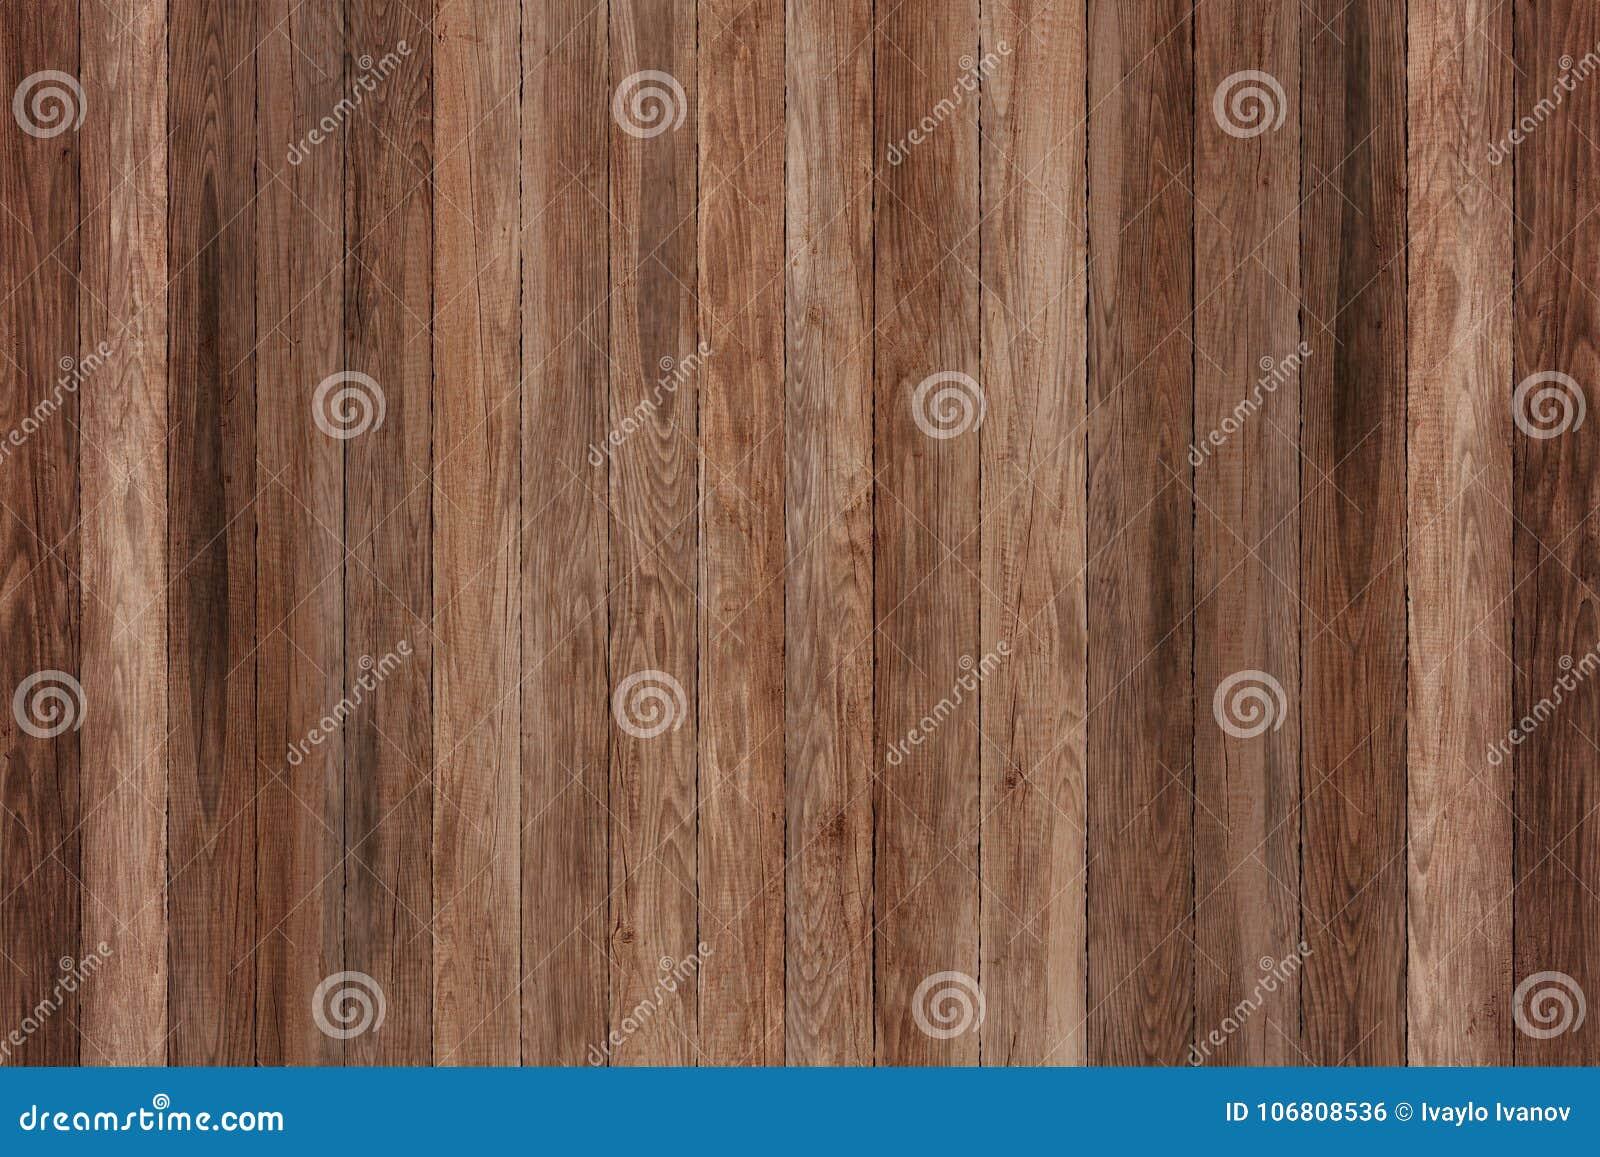 Grunge wood panels. Planks Background. Old wall wooden vintage floor